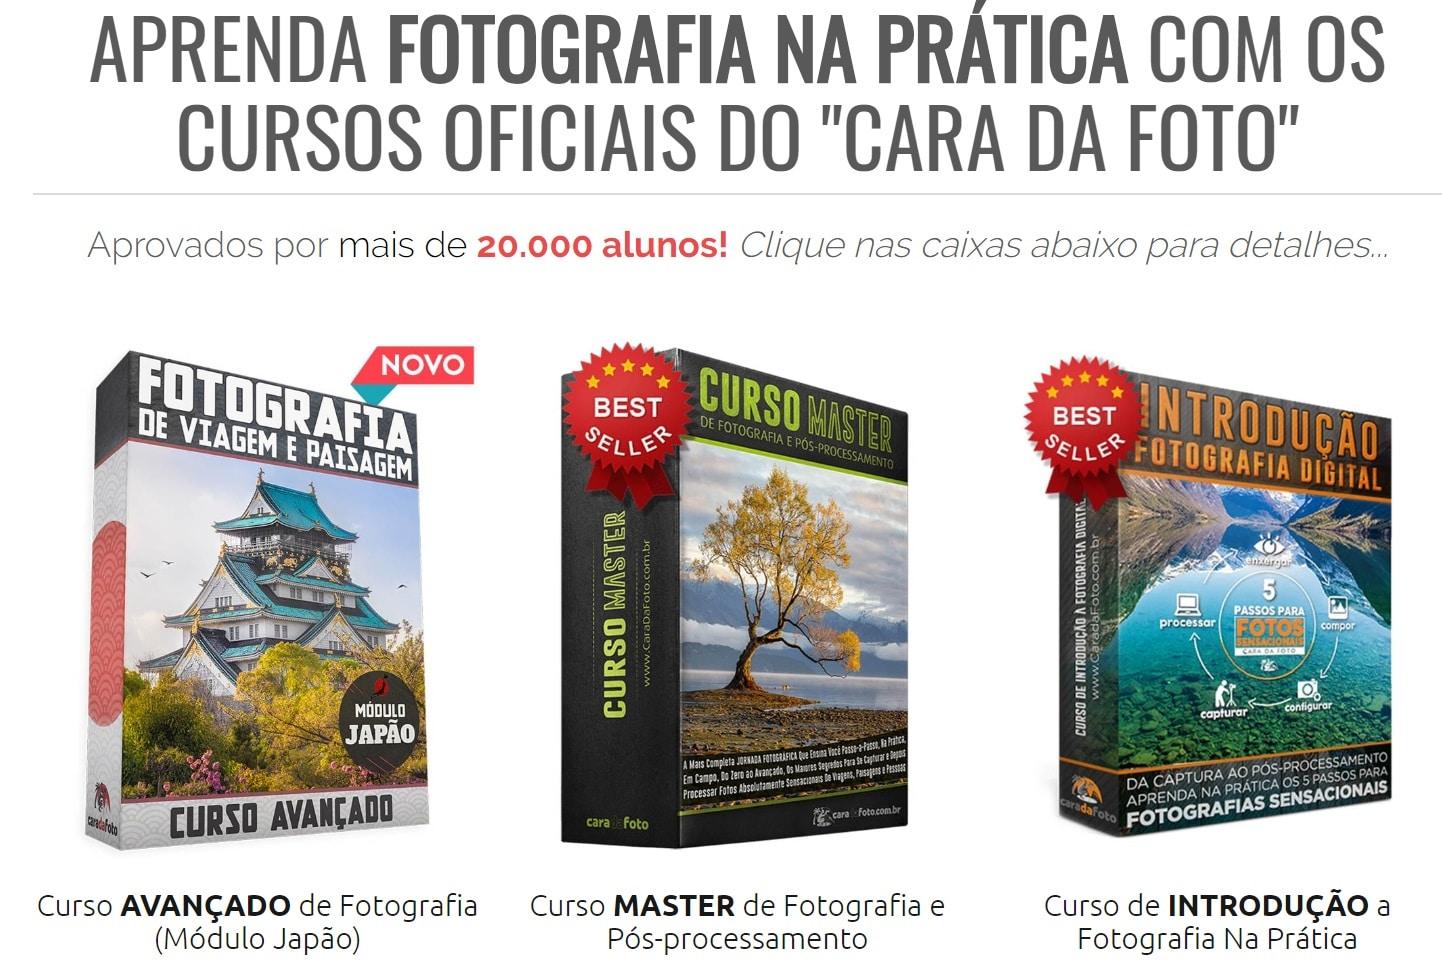 Curso de Fotografia Online - Cara Da Foto